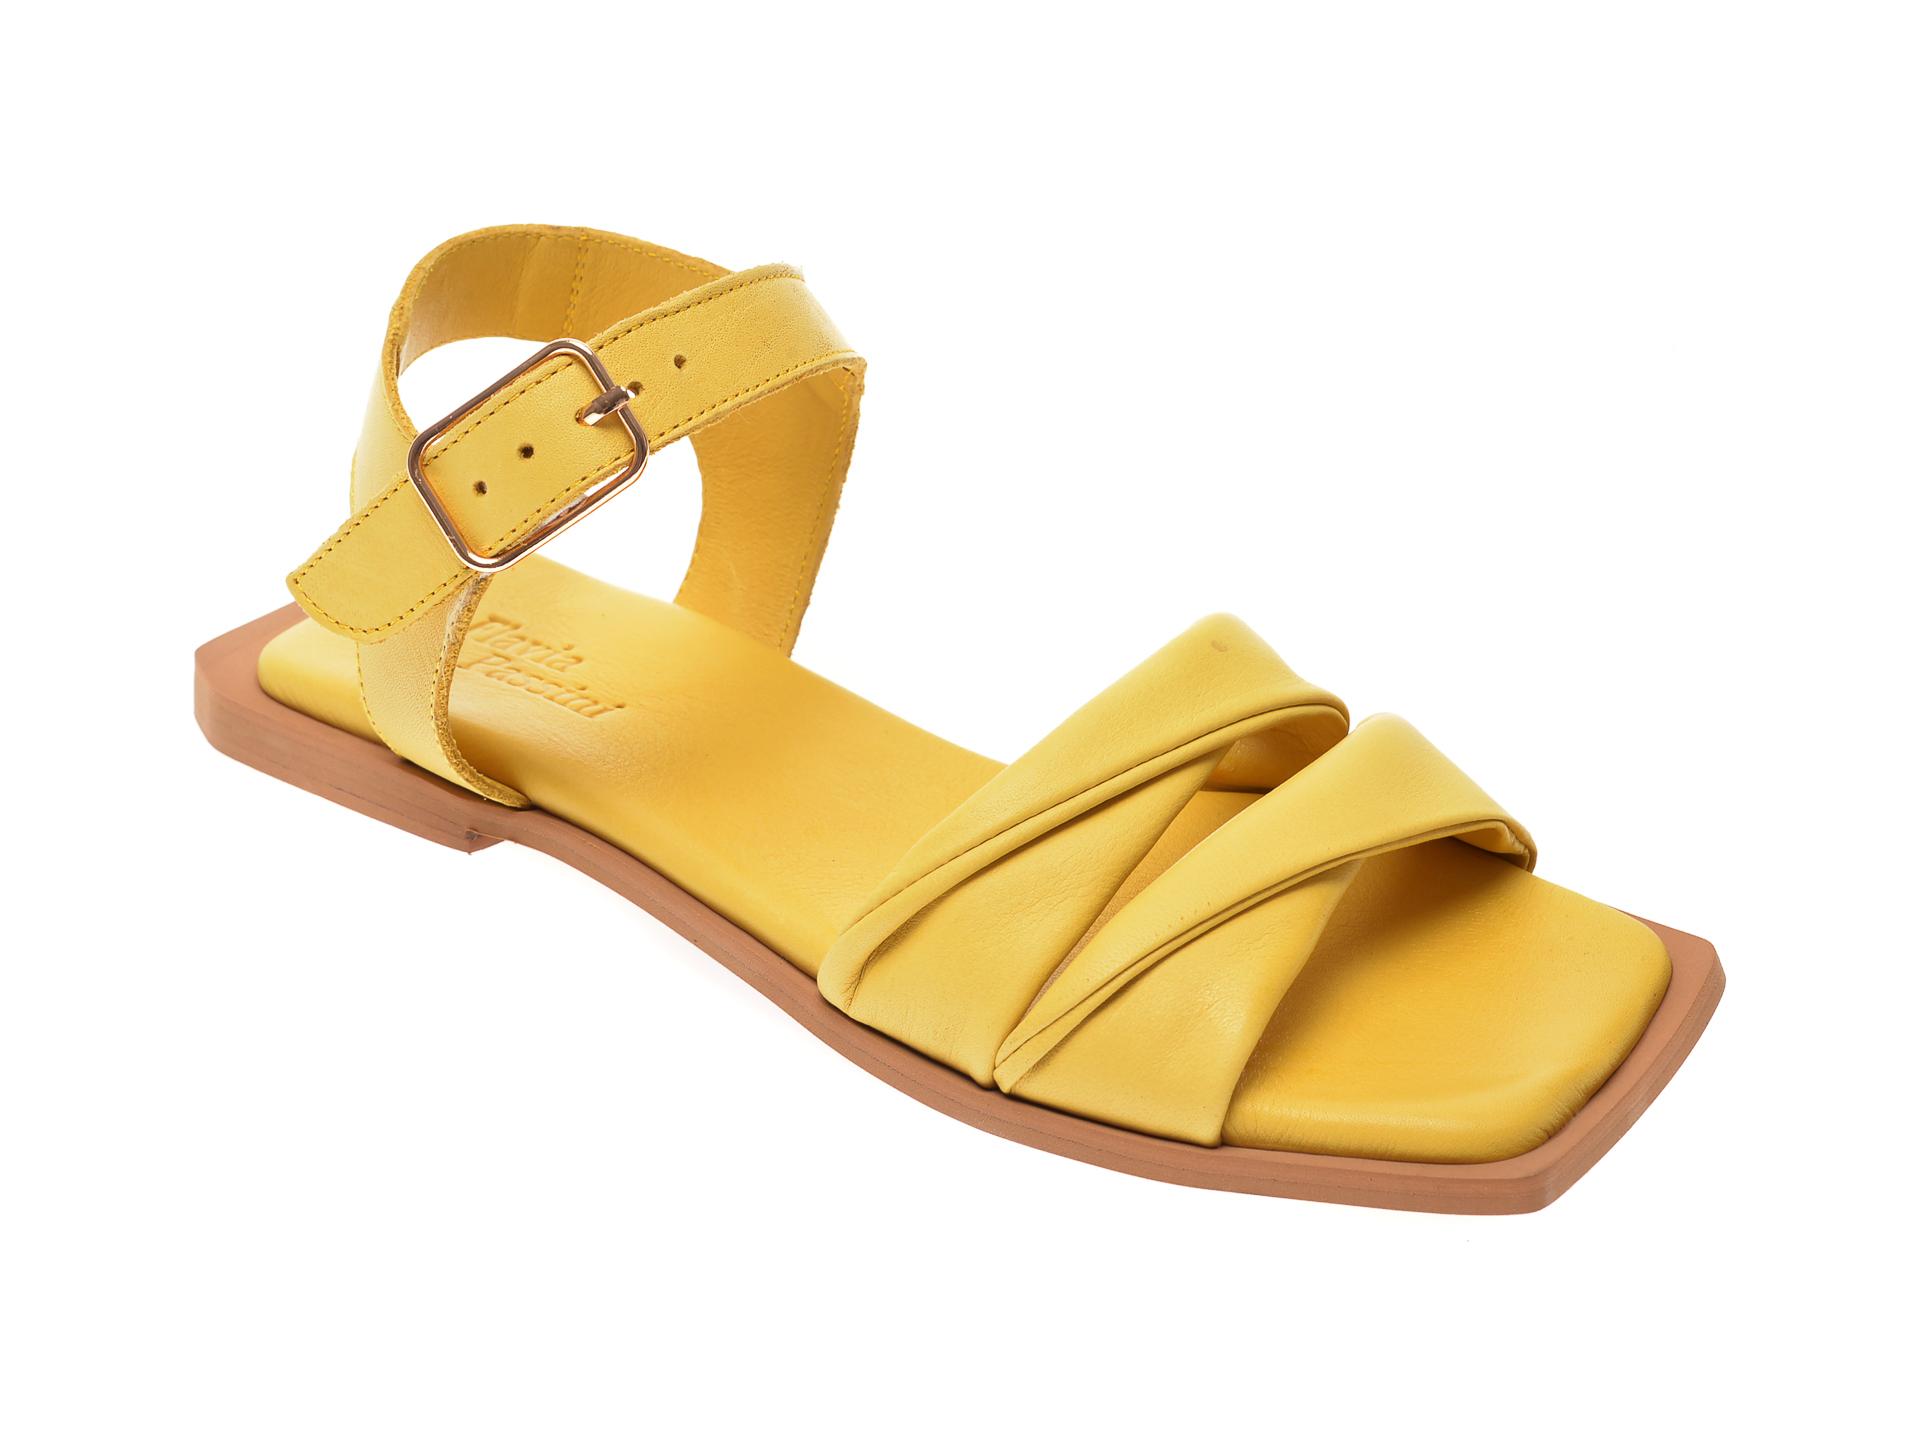 Sandale FLAVIA PASSINI galbene, 407, din piele naturala